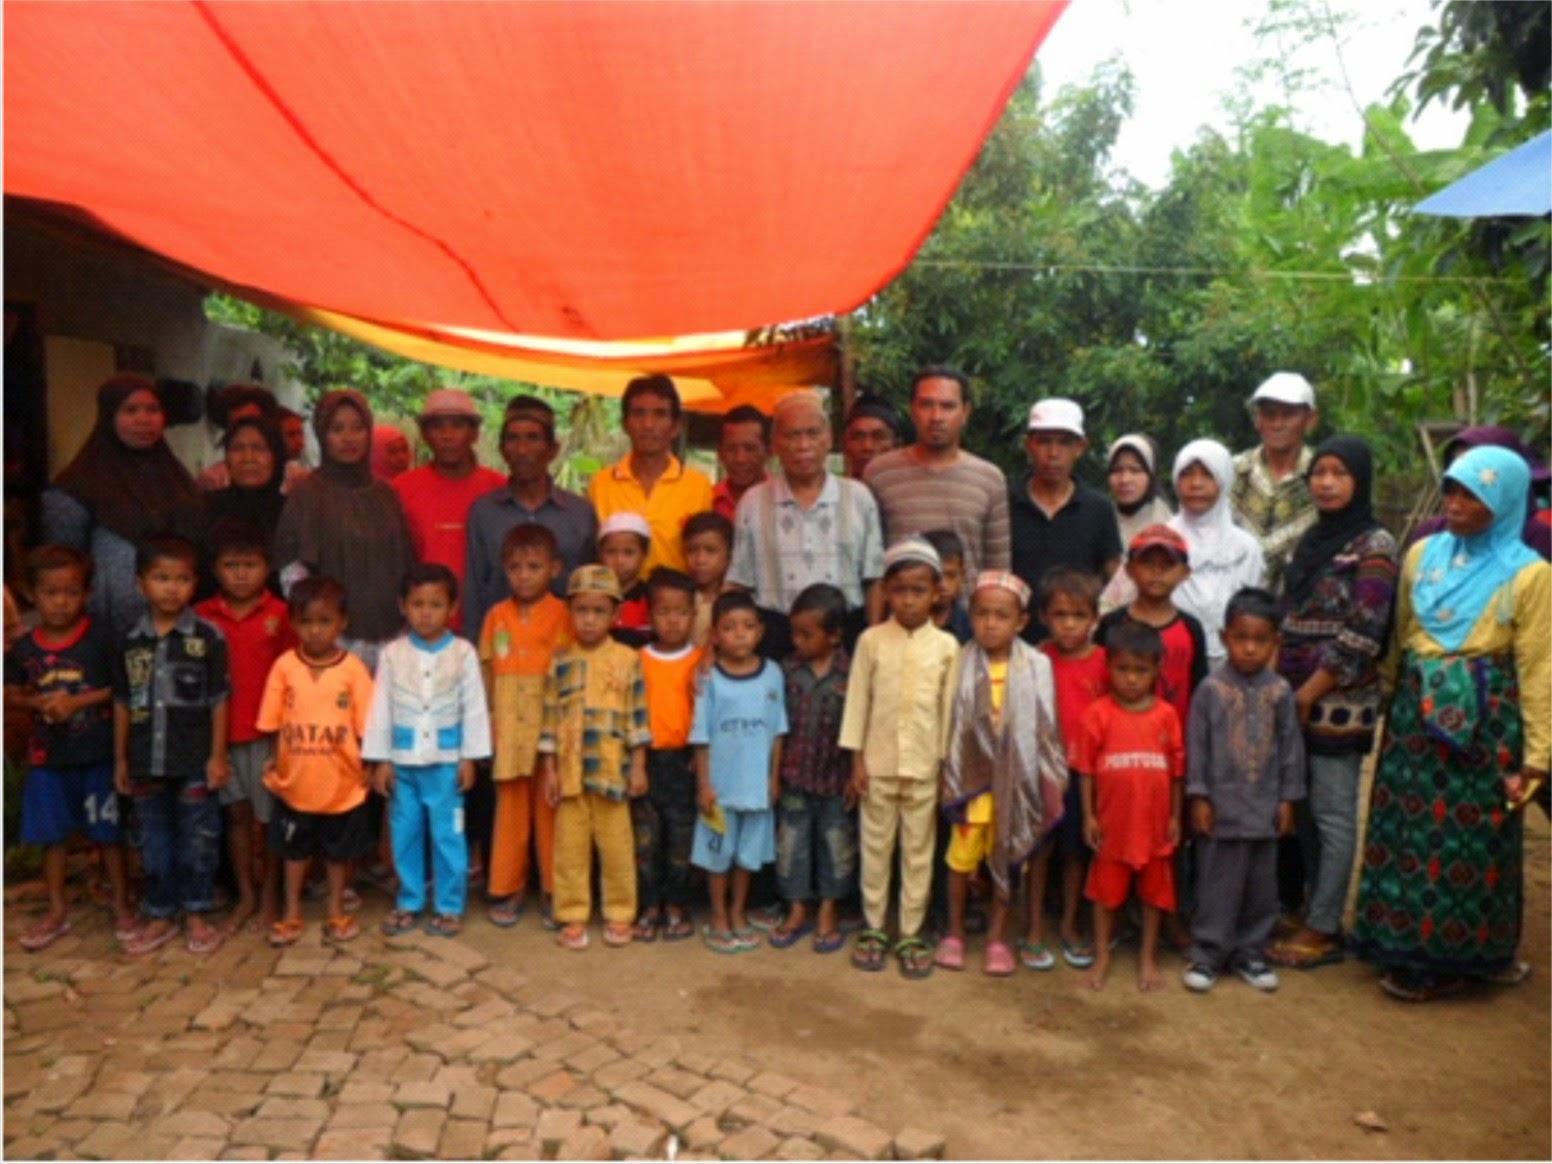 LSM Aliansi Indonesia Adakan Sunatan Massal di Desa Rato Lambu